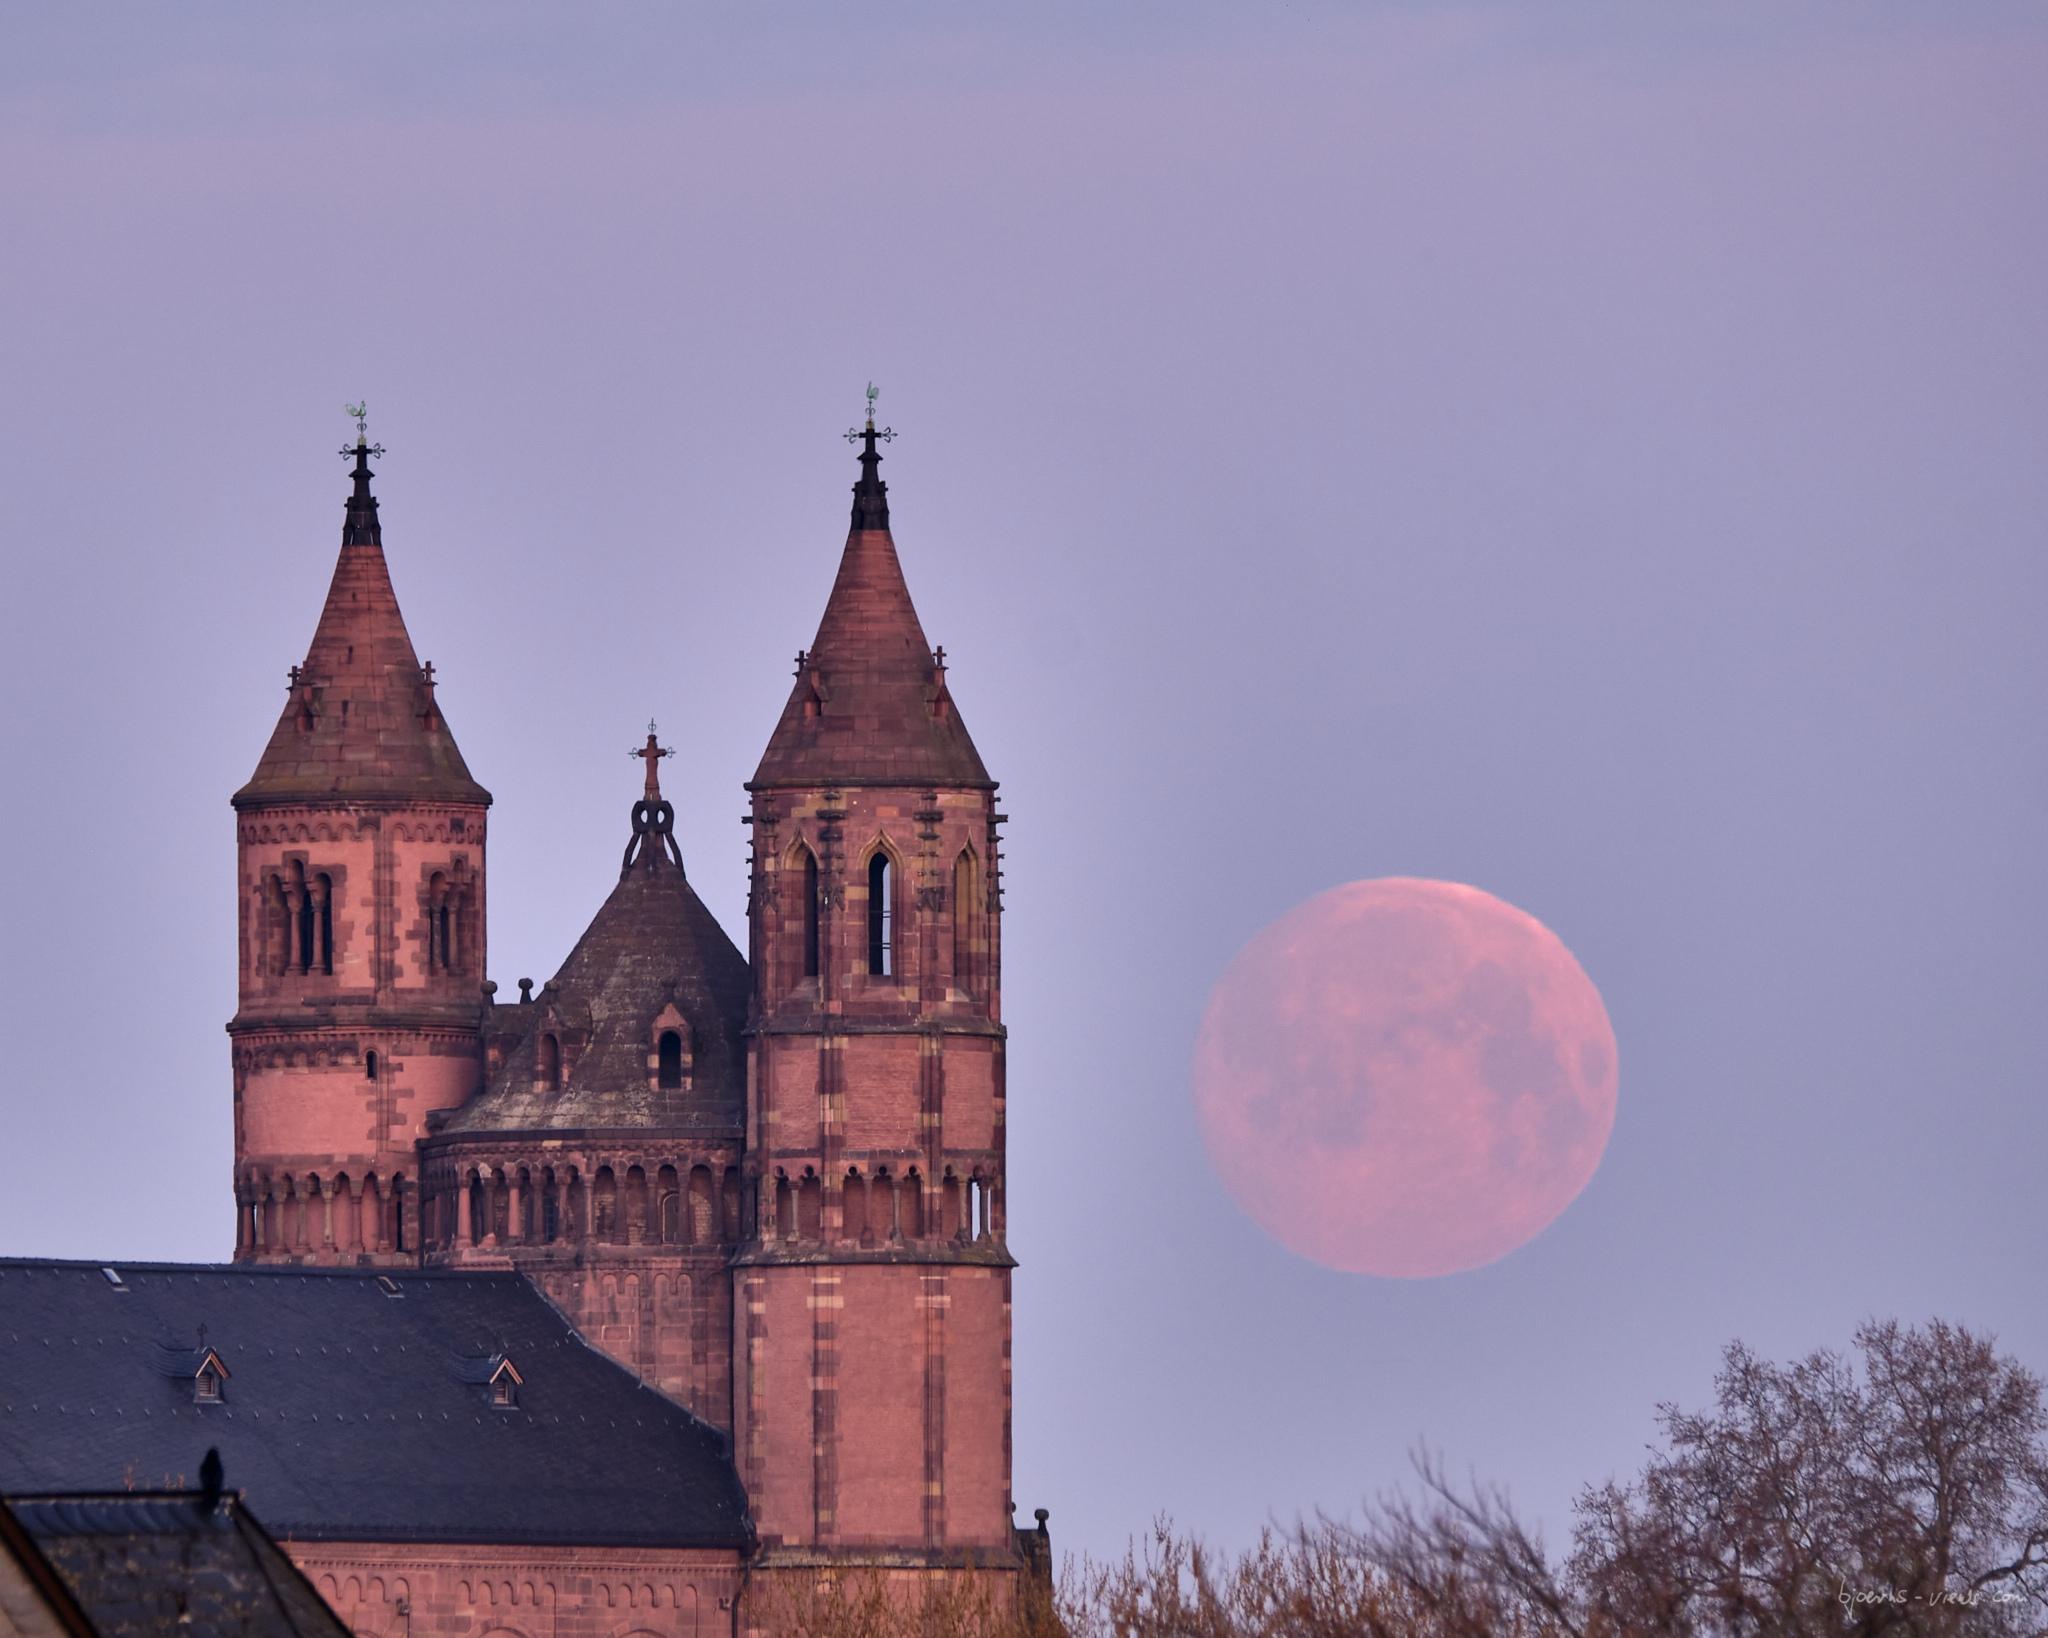 Monduntergang, Rheinbrücke, Rhein, Dom, Mond, Moon, Moonset, Bridge, Brücke, Rhein, Pfalz, Rheinhessen